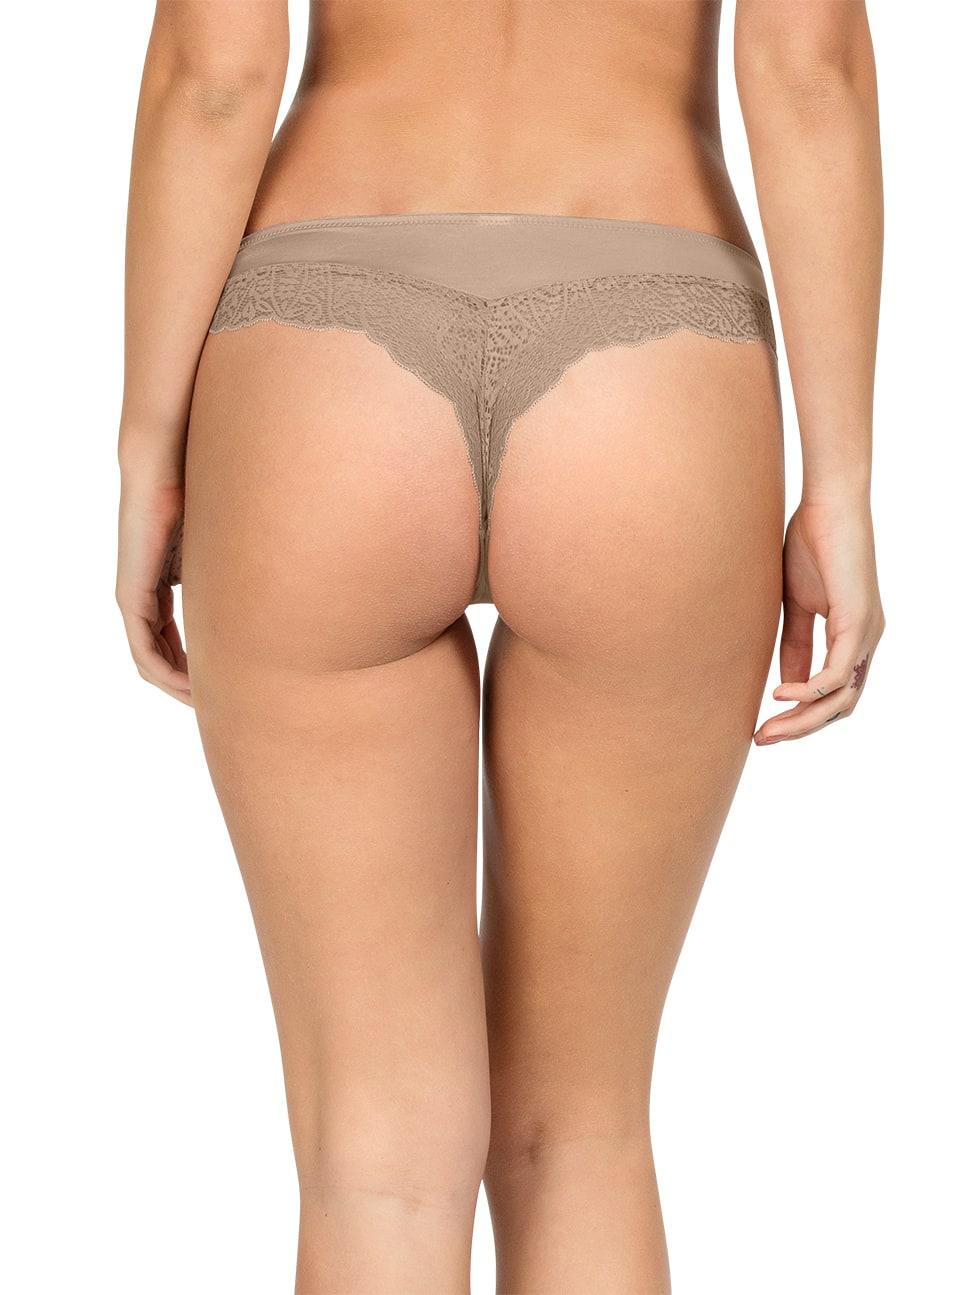 Nouveau Brazilian Thong - European Nude - A1534